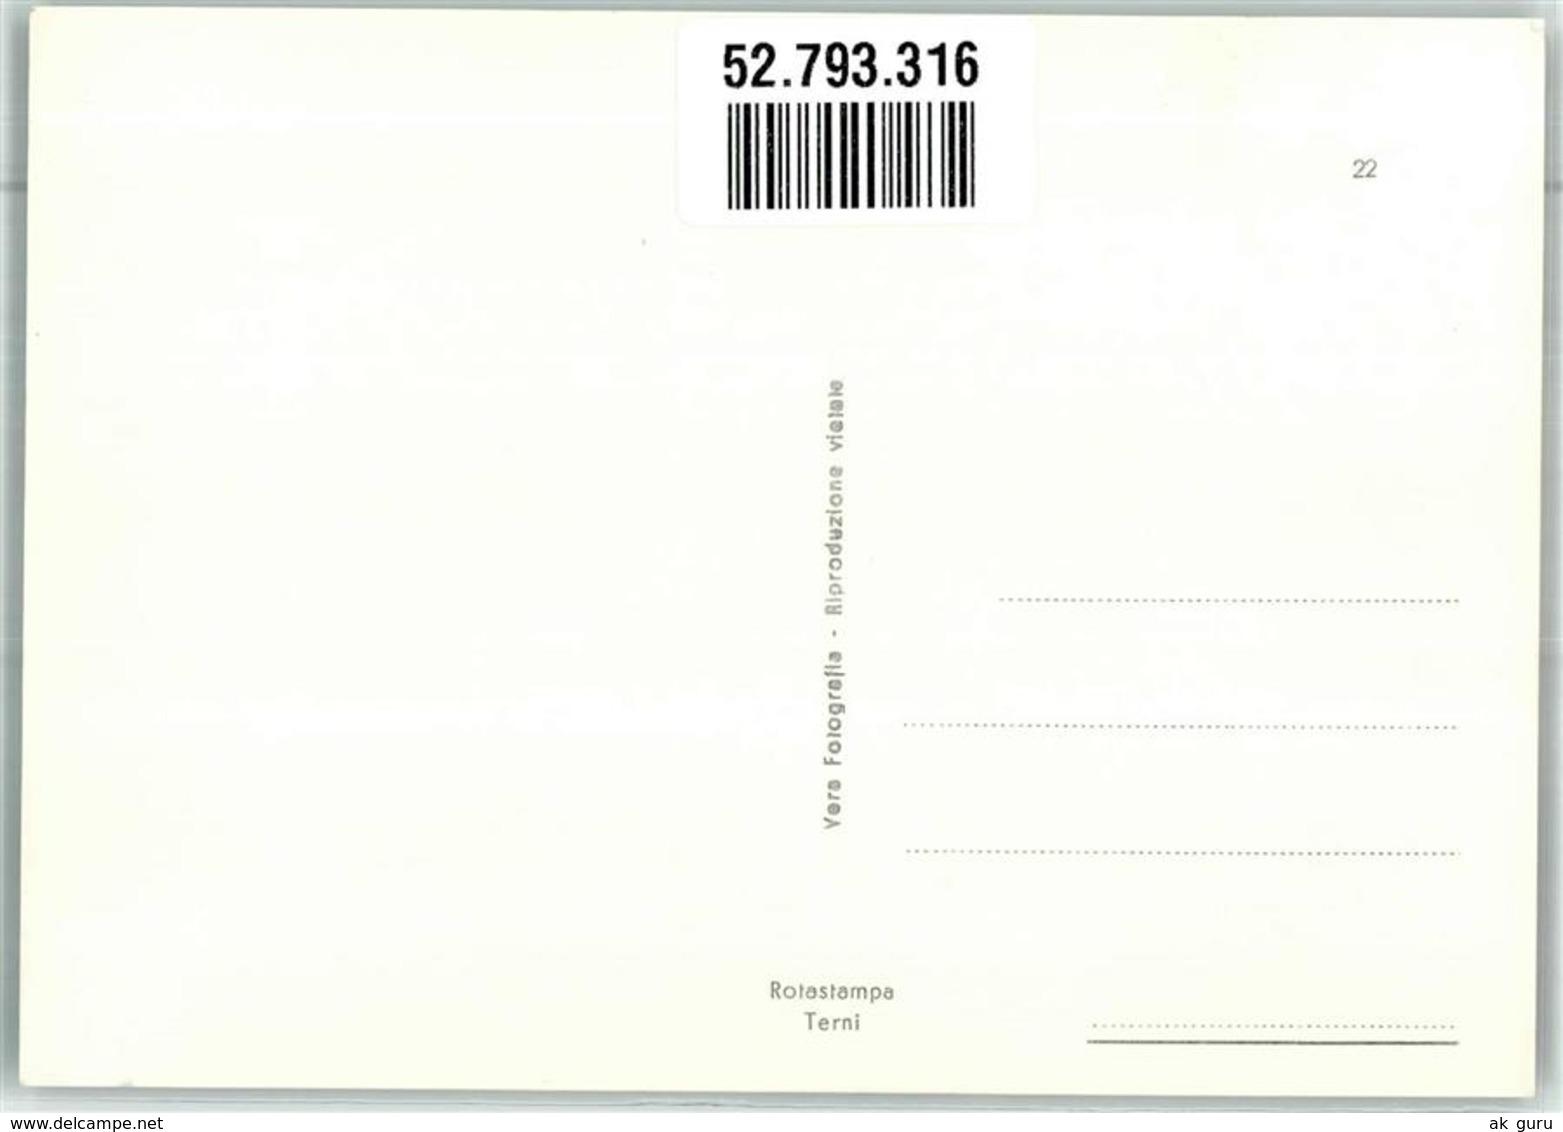 52793316 - Positano - Italy